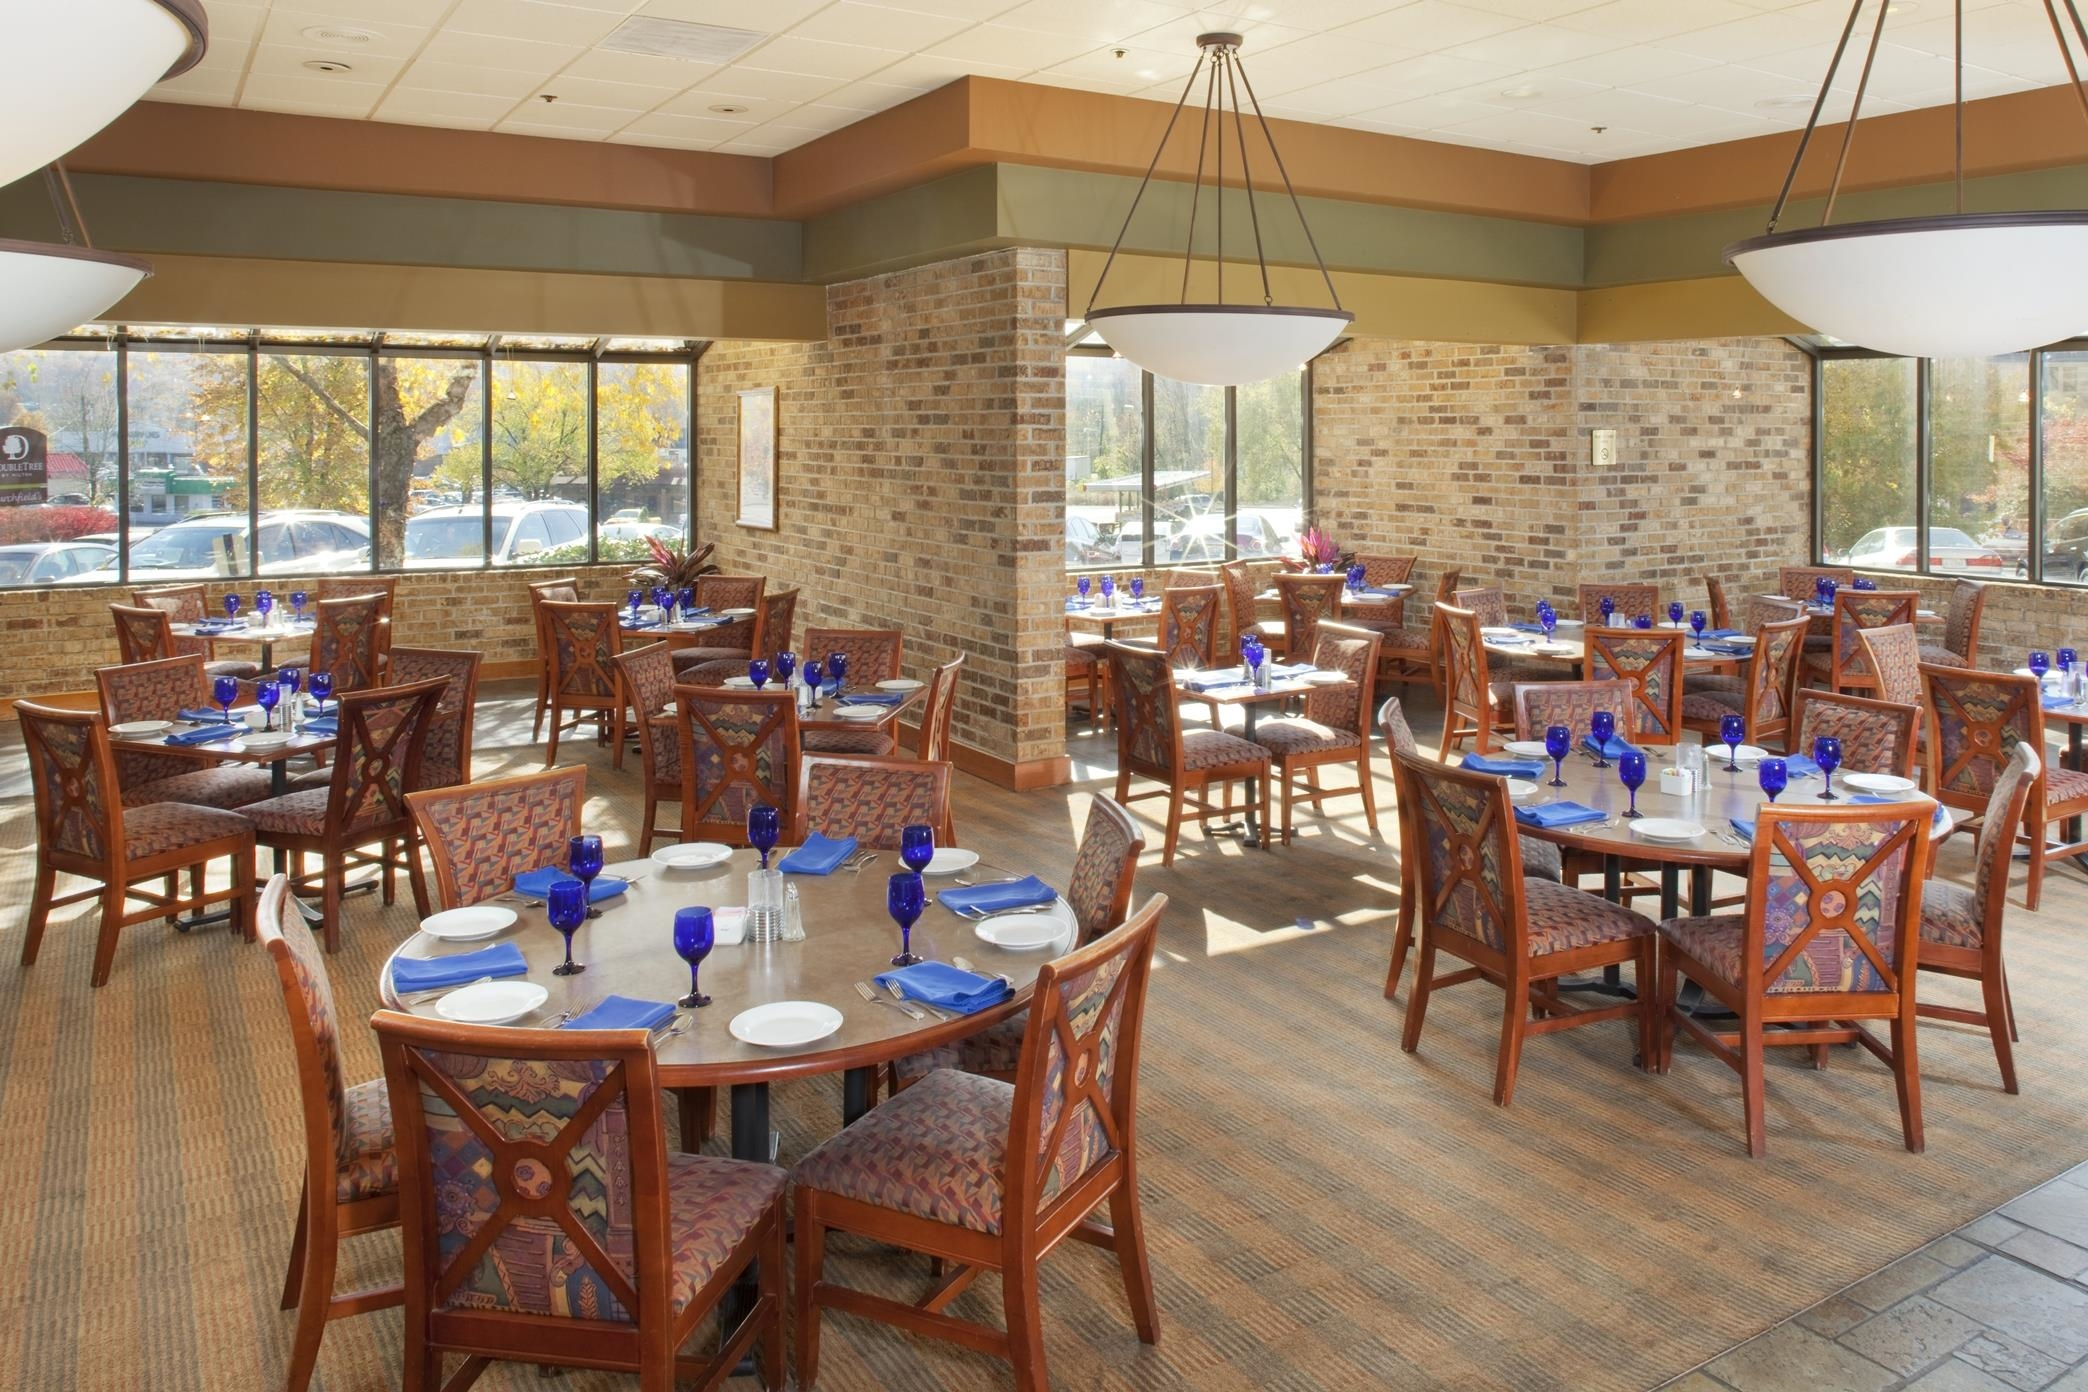 DoubleTree by Hilton Hotel Oak Ridge - Knoxville image 7